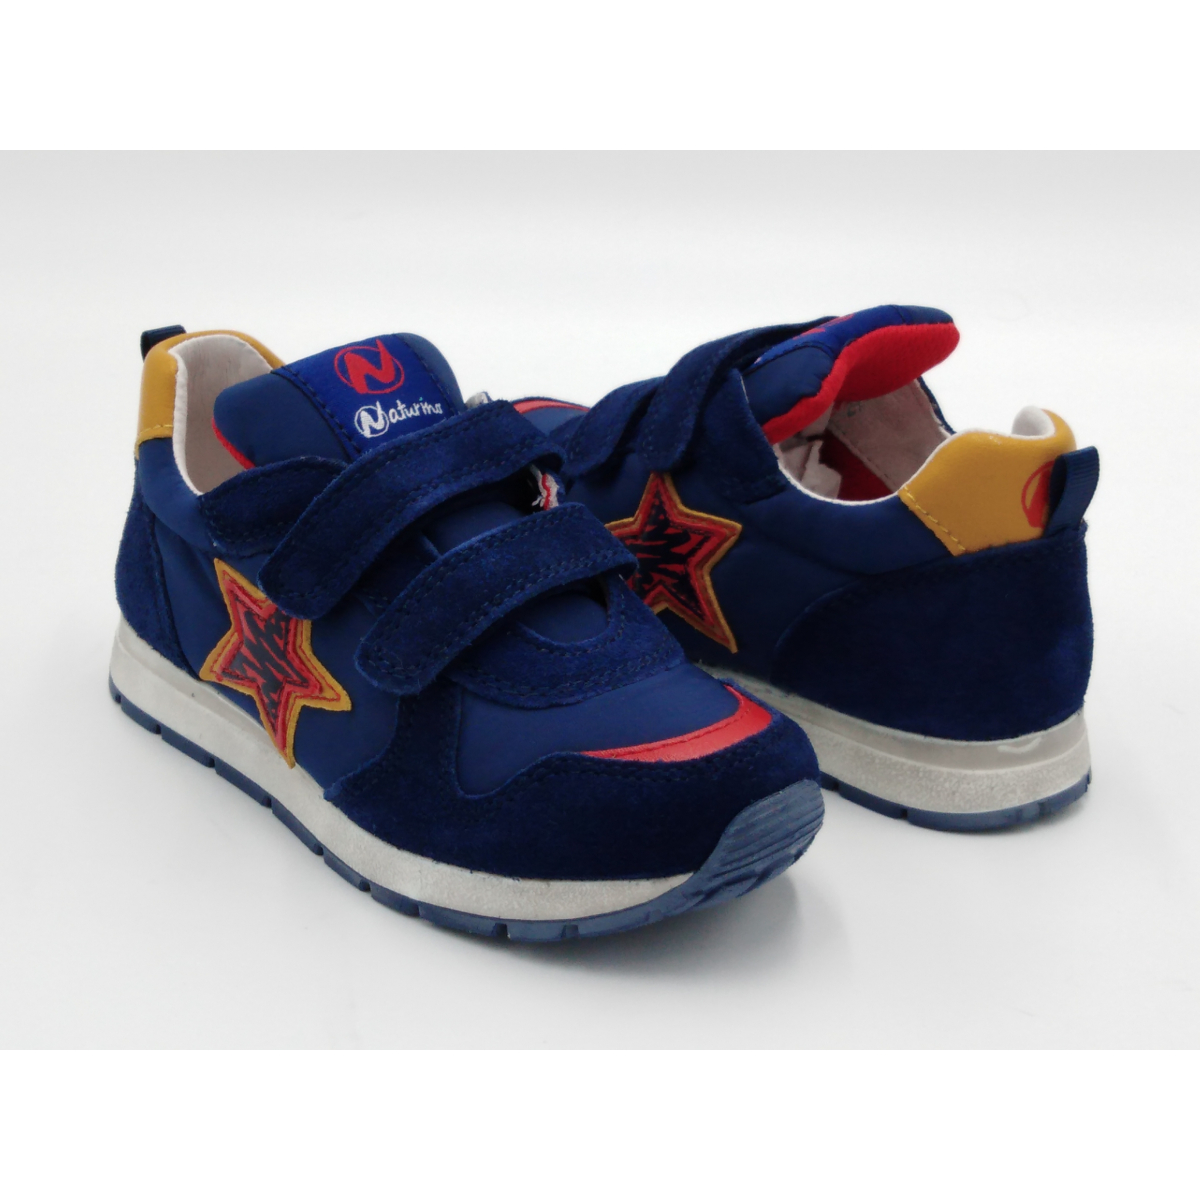 Naturino Pat vl - Sneaker...